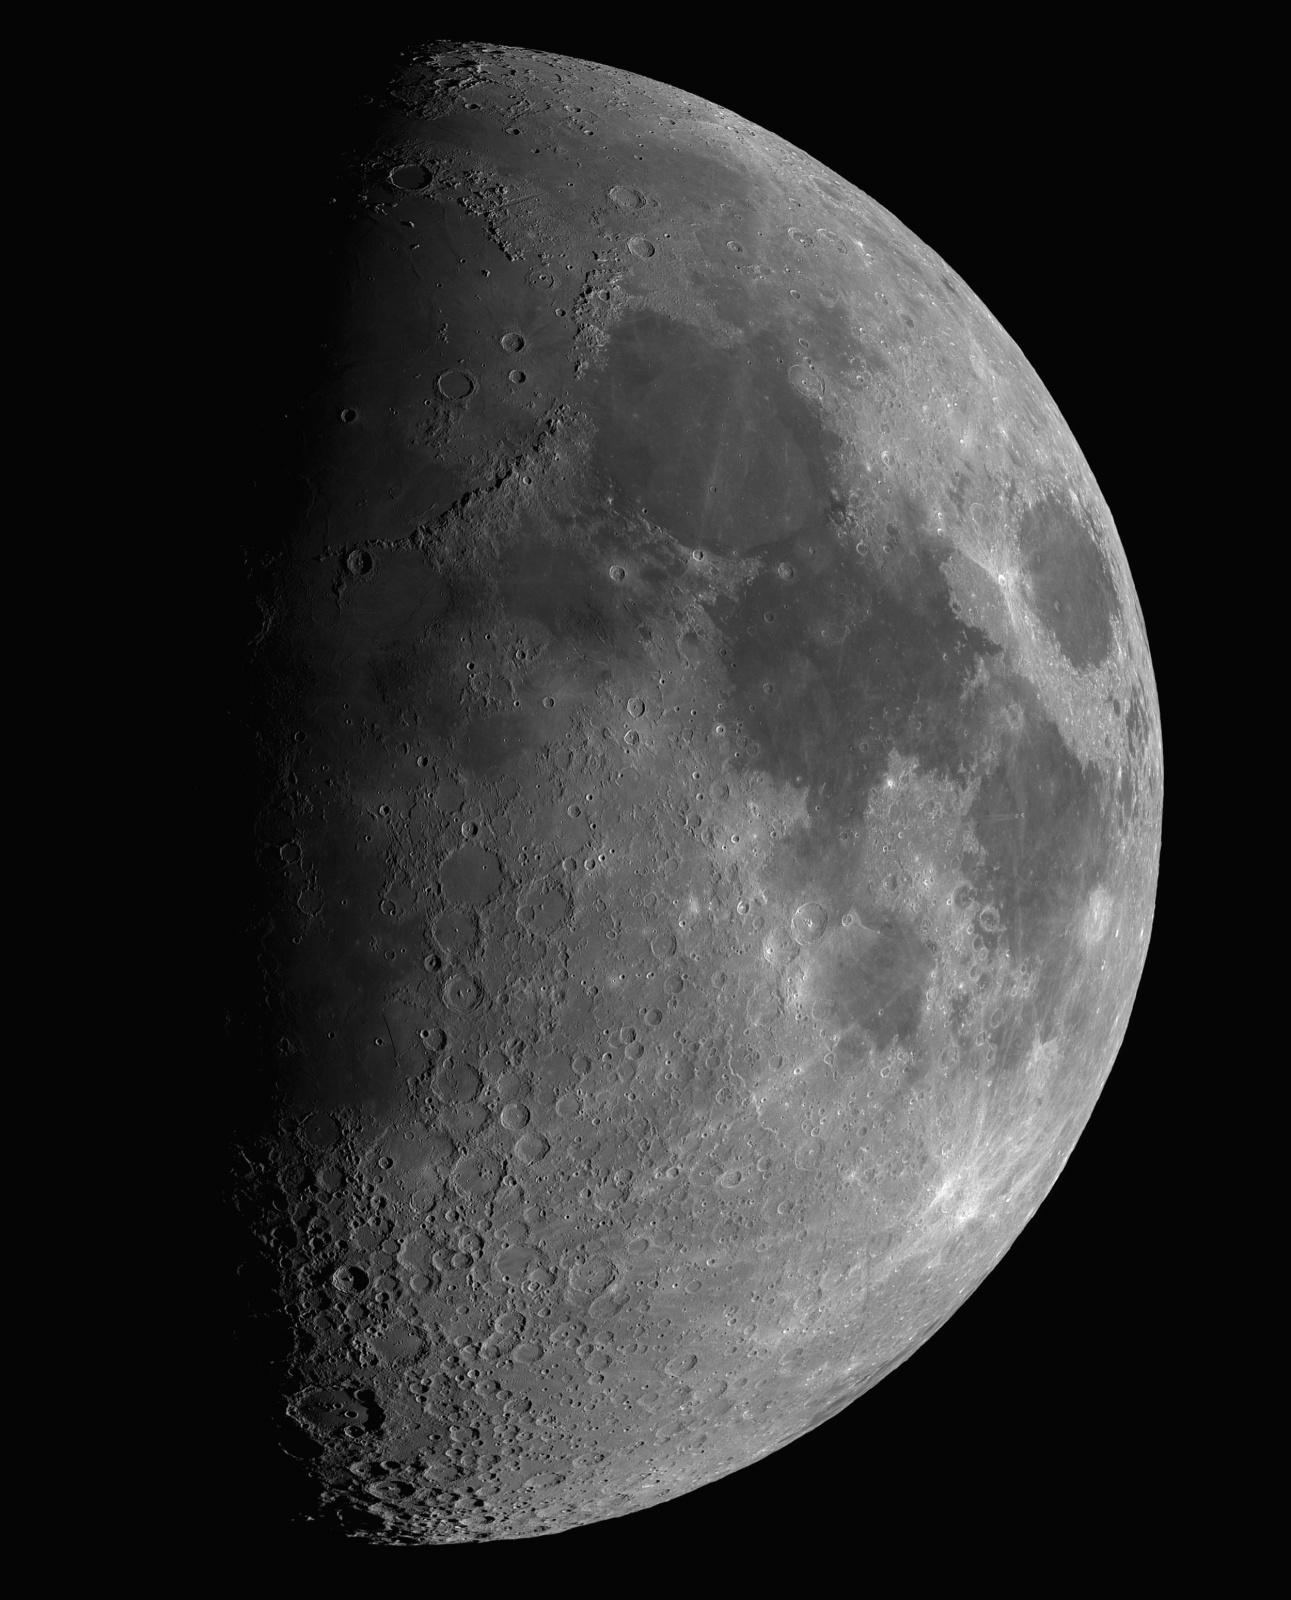 Księżyc 1d po I kw.  22.03.2021r_18.20_TS152F900_ASI290MM_Omegon Halpha 12nm_mozaika105%....jpg